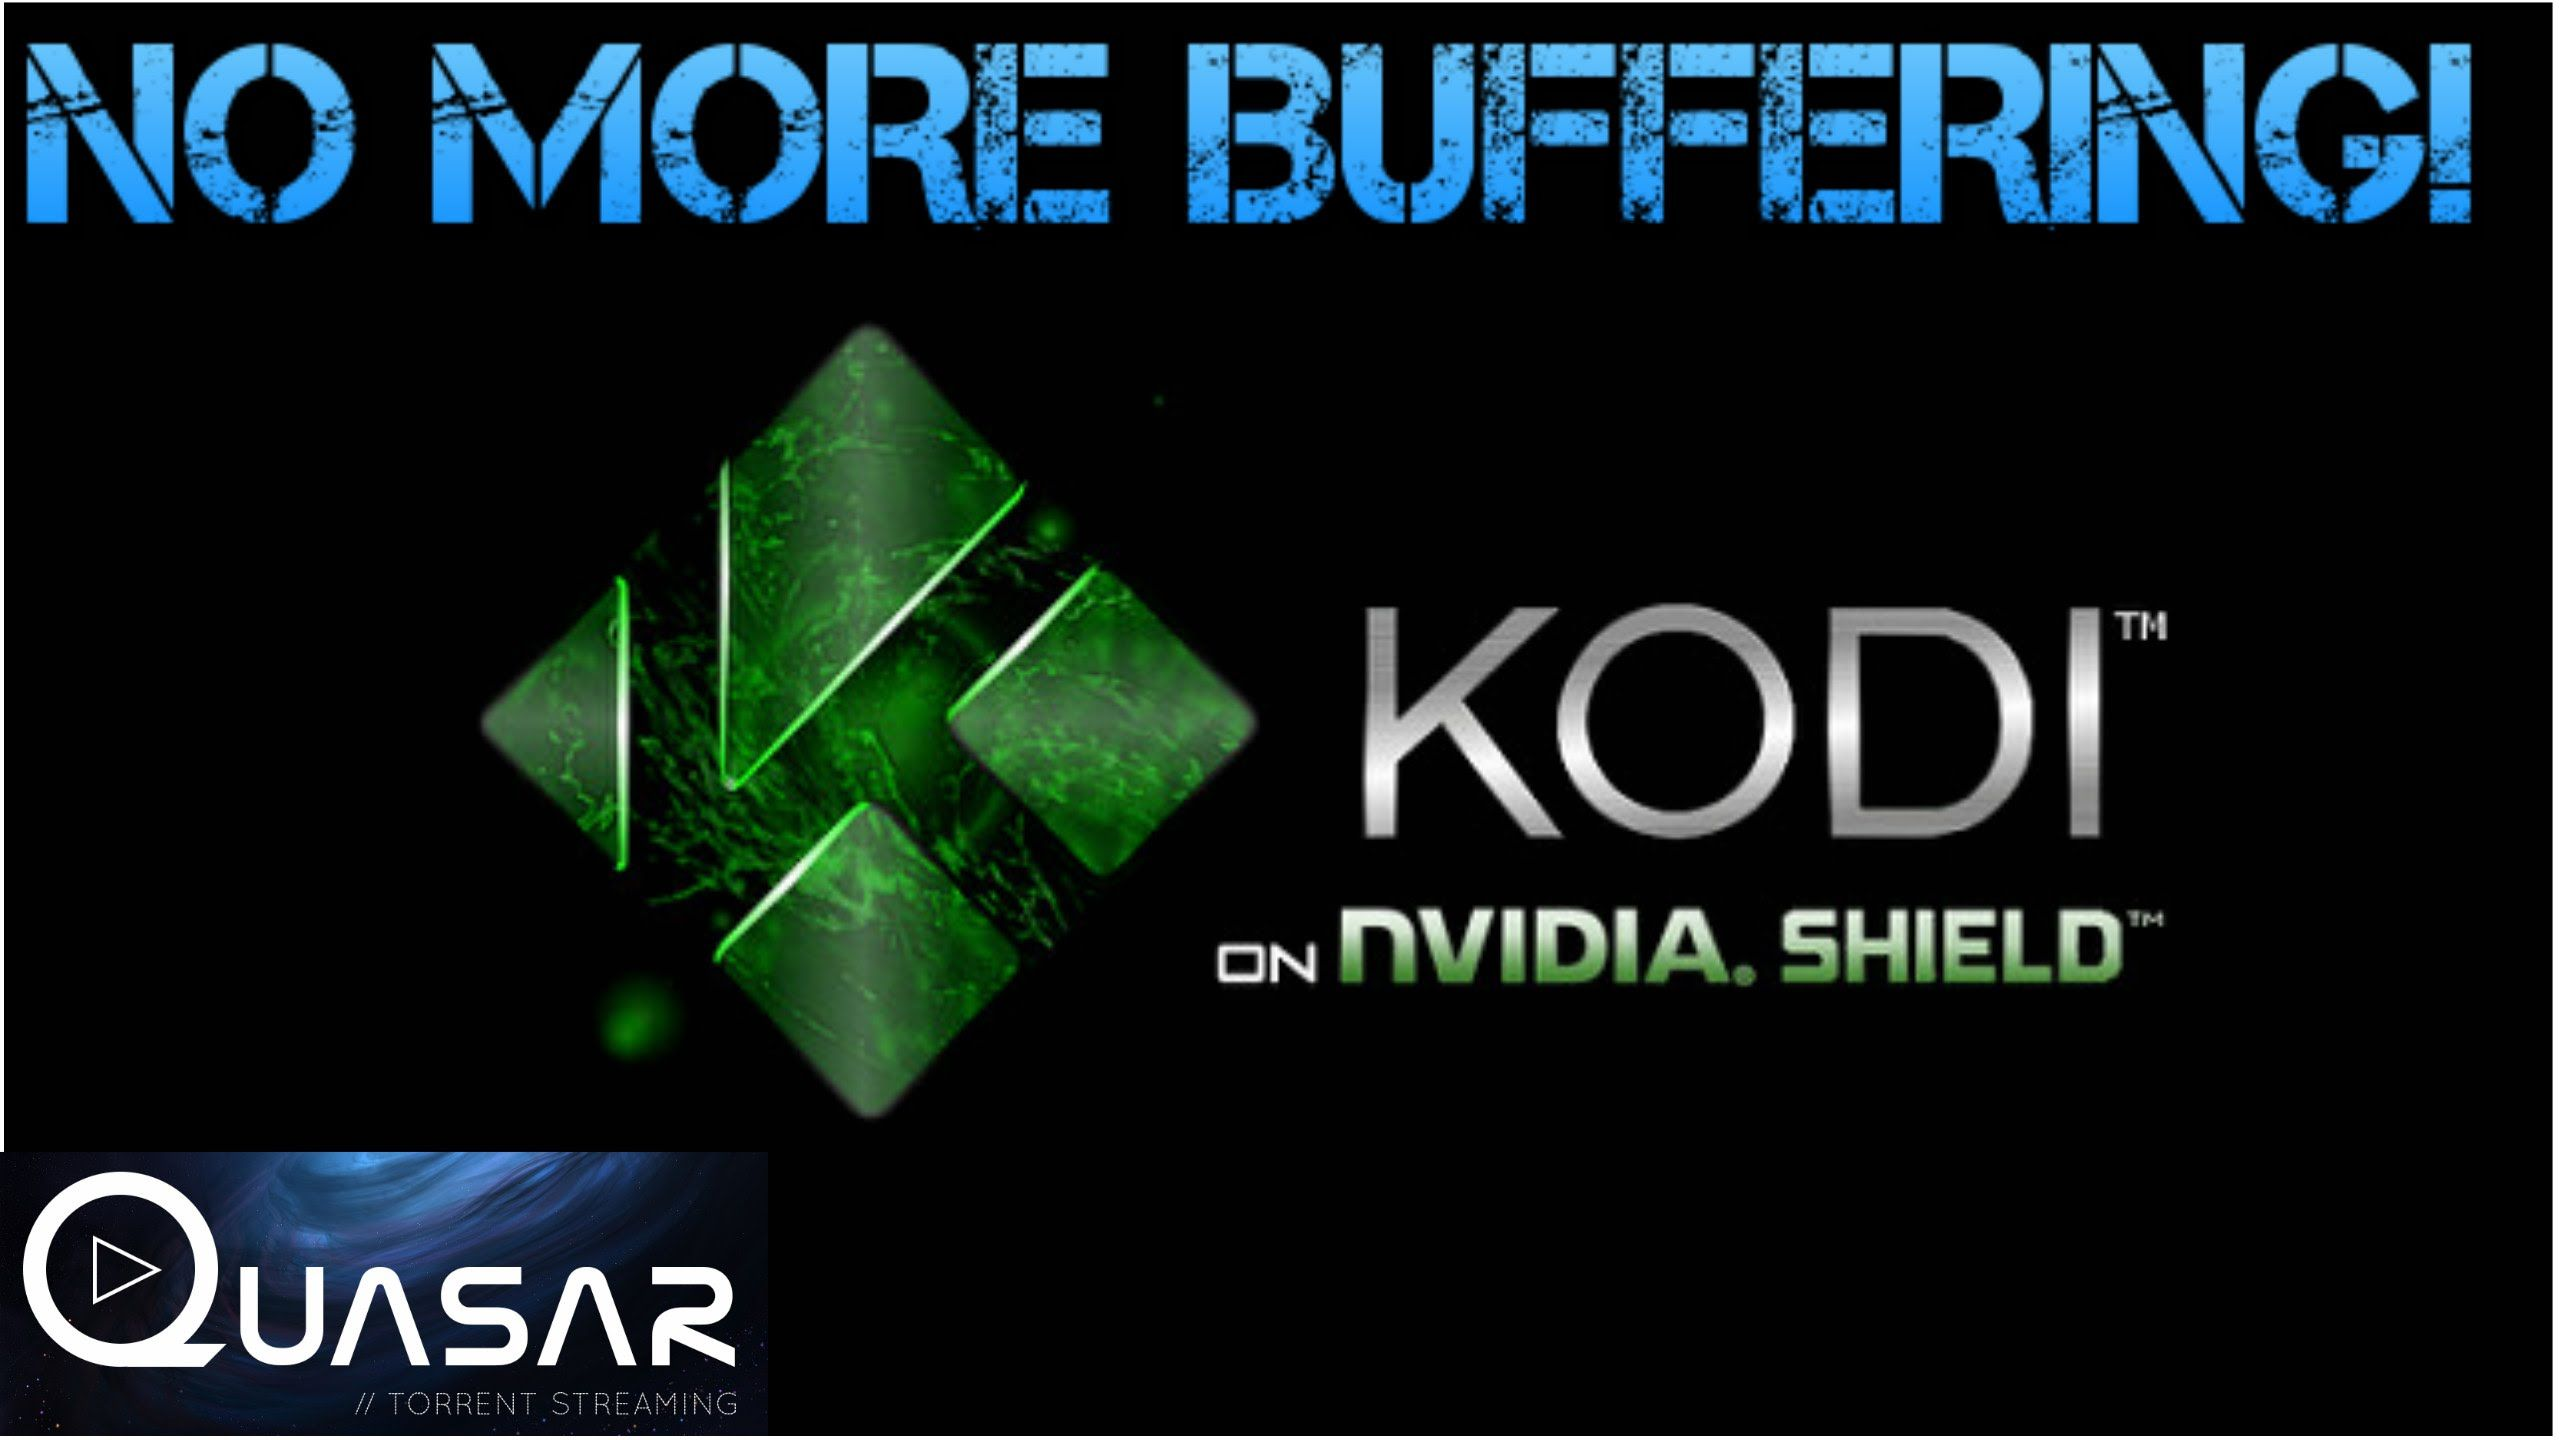 Nvidia Shield Buffer Free Streaming! Best HD Streams on